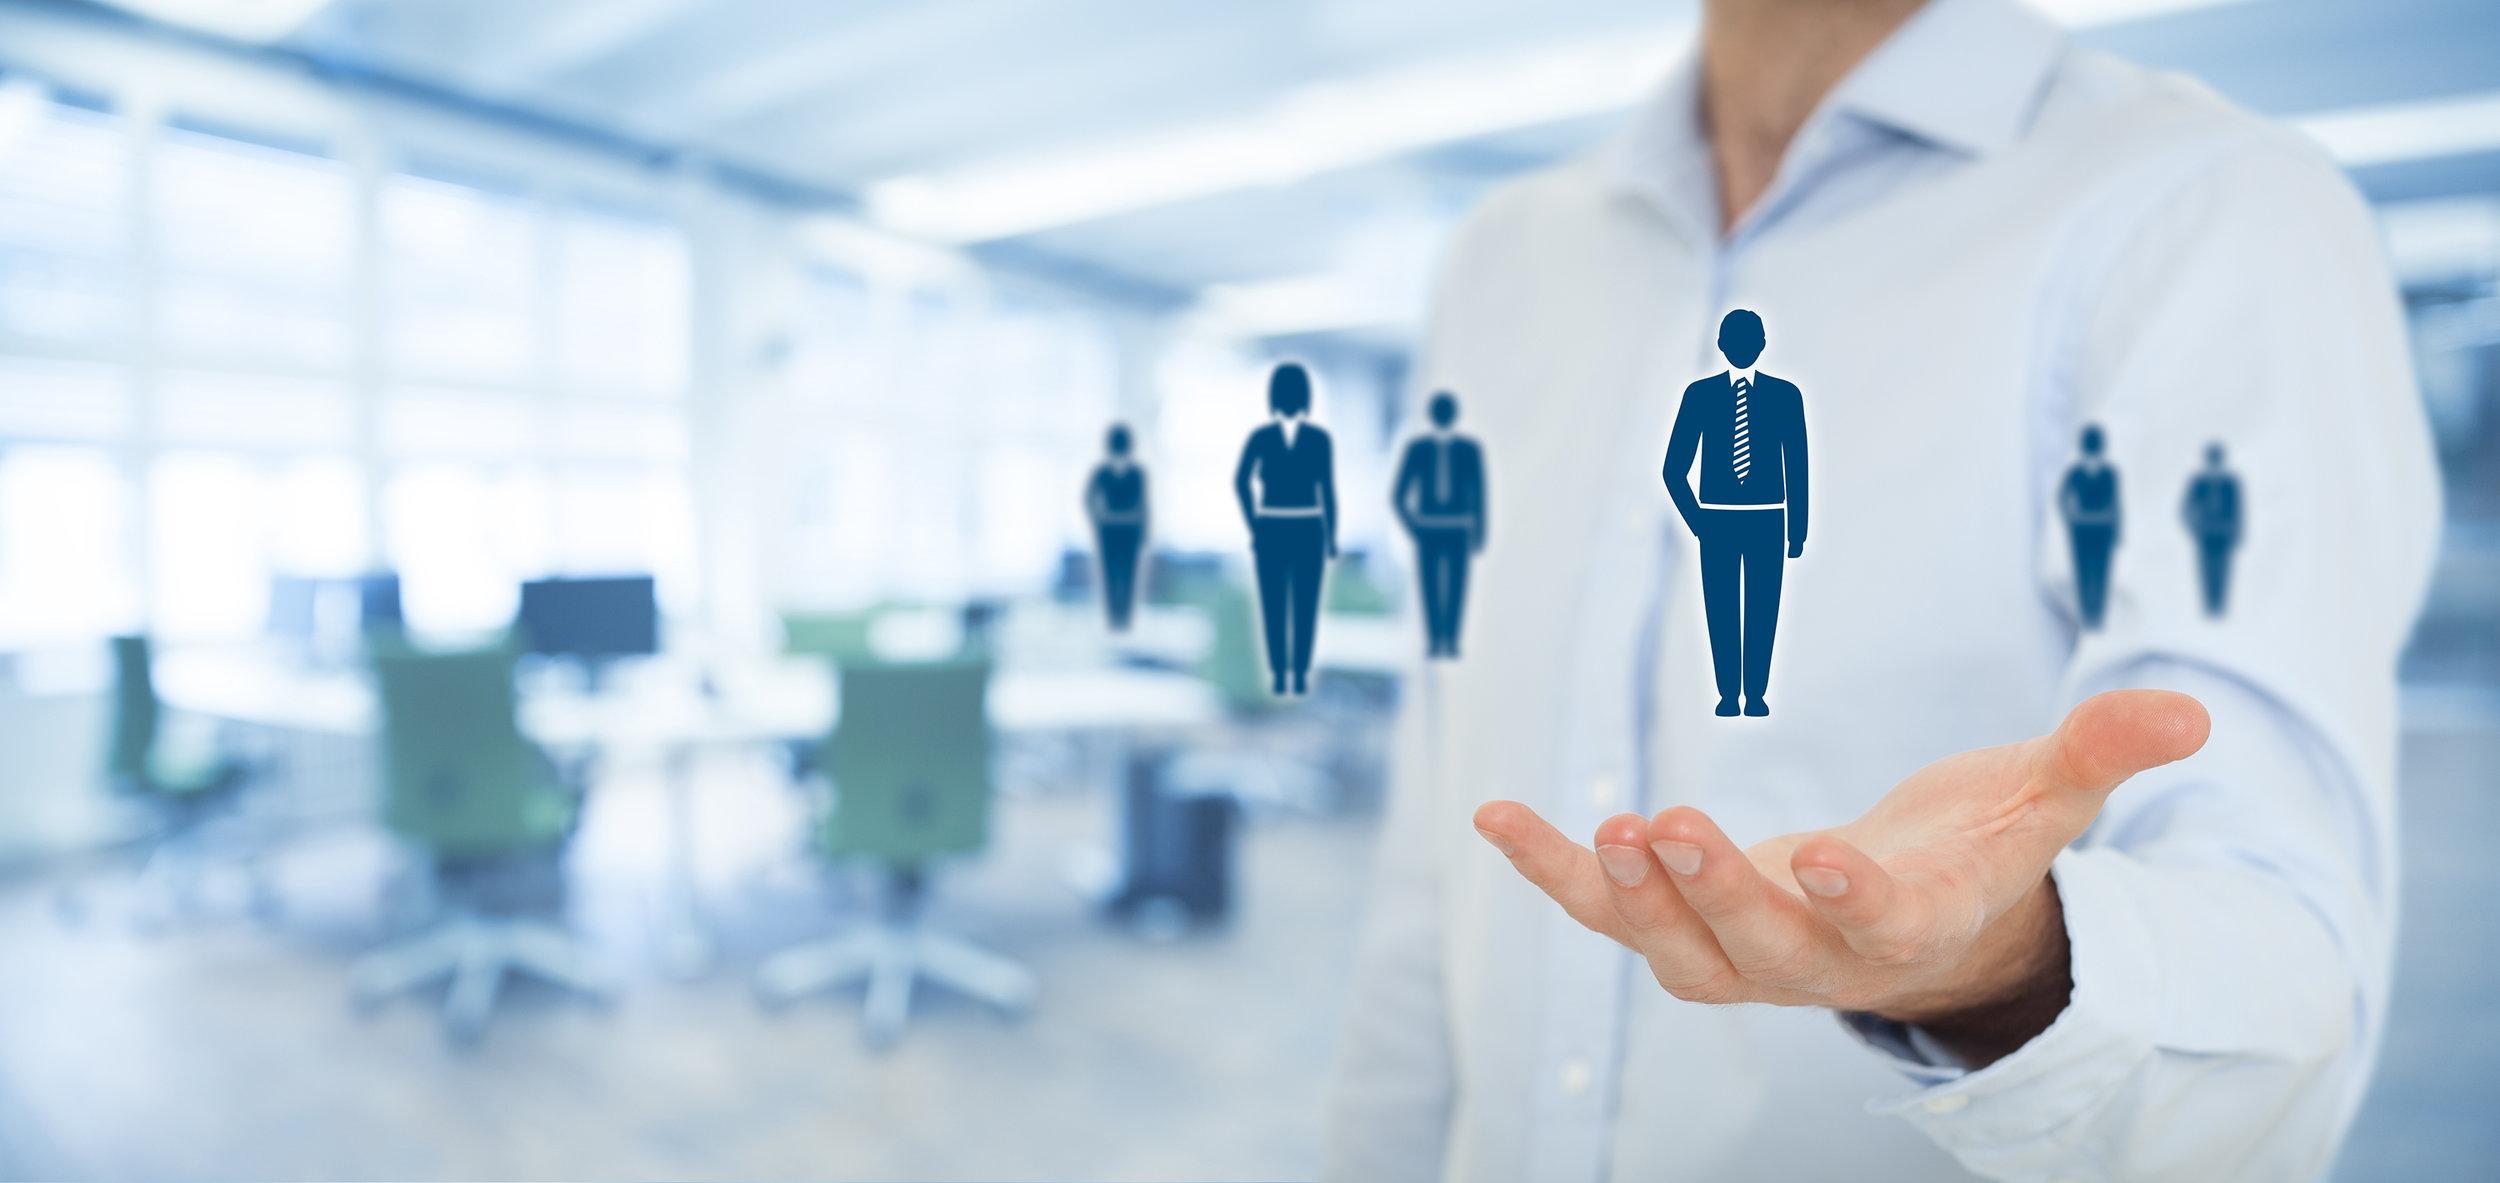 assurances-obligatoires-portugal-freelance